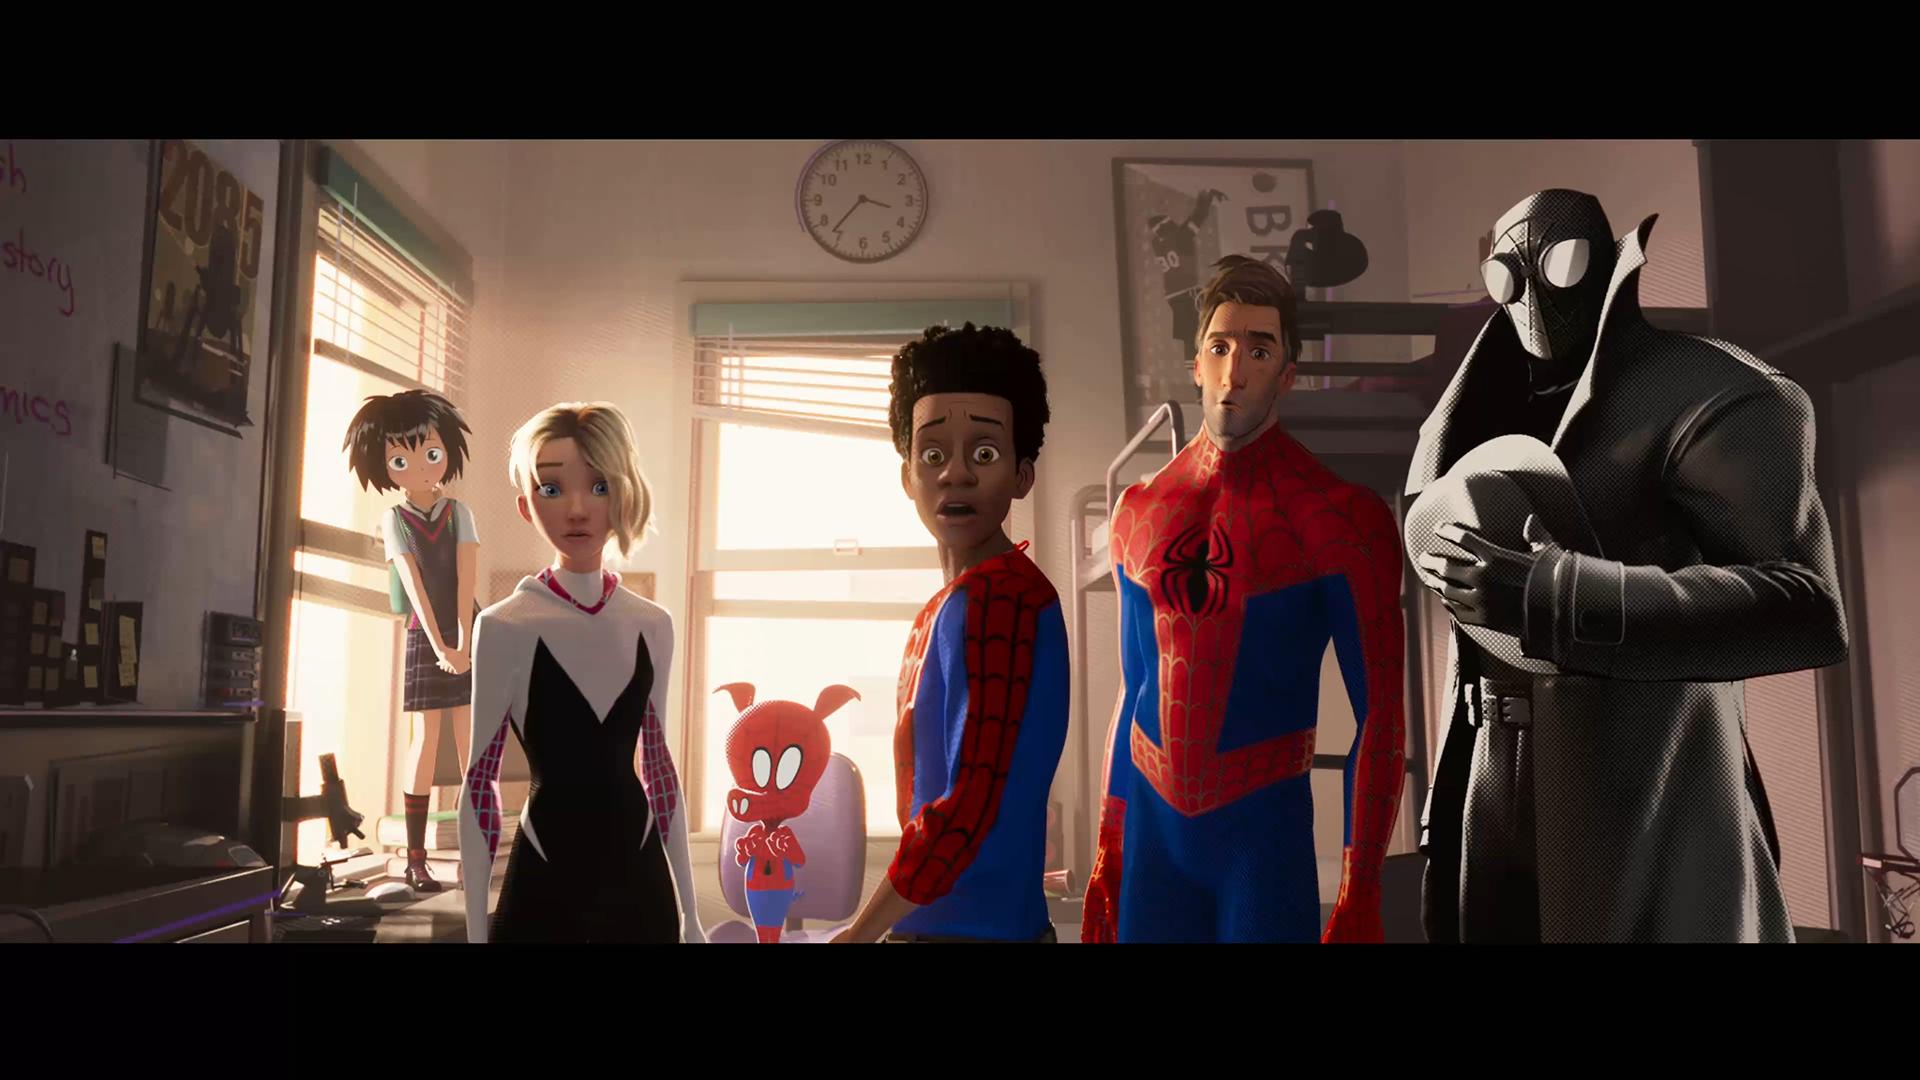 Wallpaper Spider Man Peter Parker Miles Morales Spider Gwen